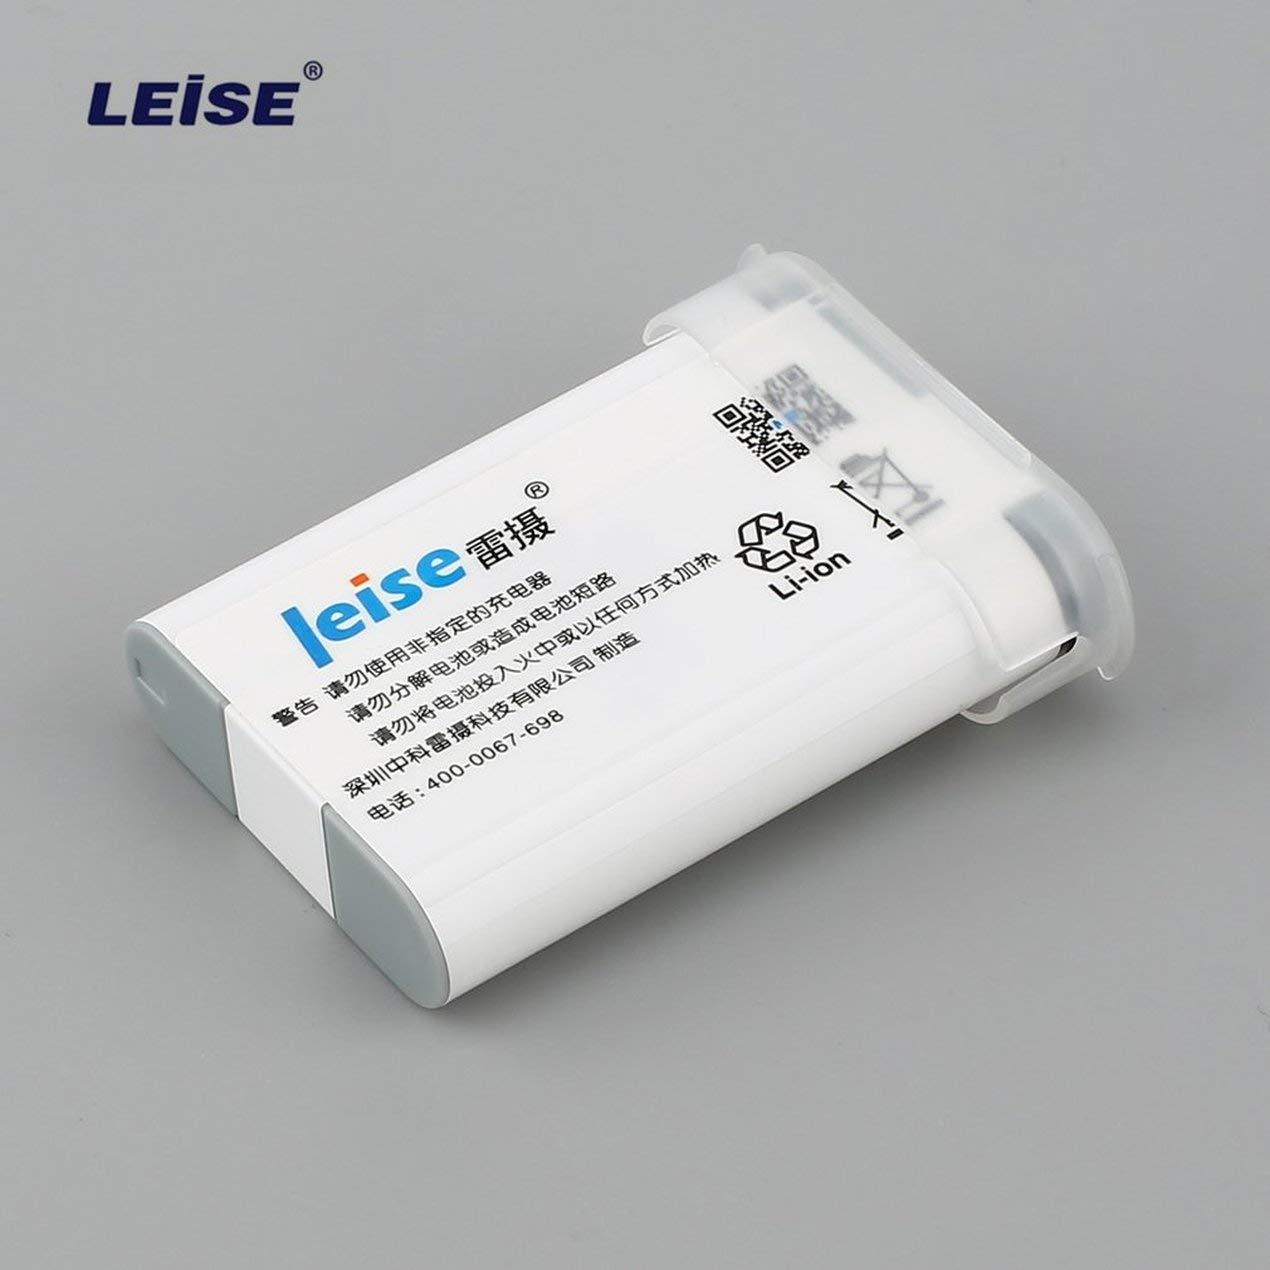 1 Pc LEISE 3.6V 1910mAh batteria ricaricabile Li-ion per fotocamera videocamera batteria di ricambio Canon NB-12L G1X MARK II Digital Dooret